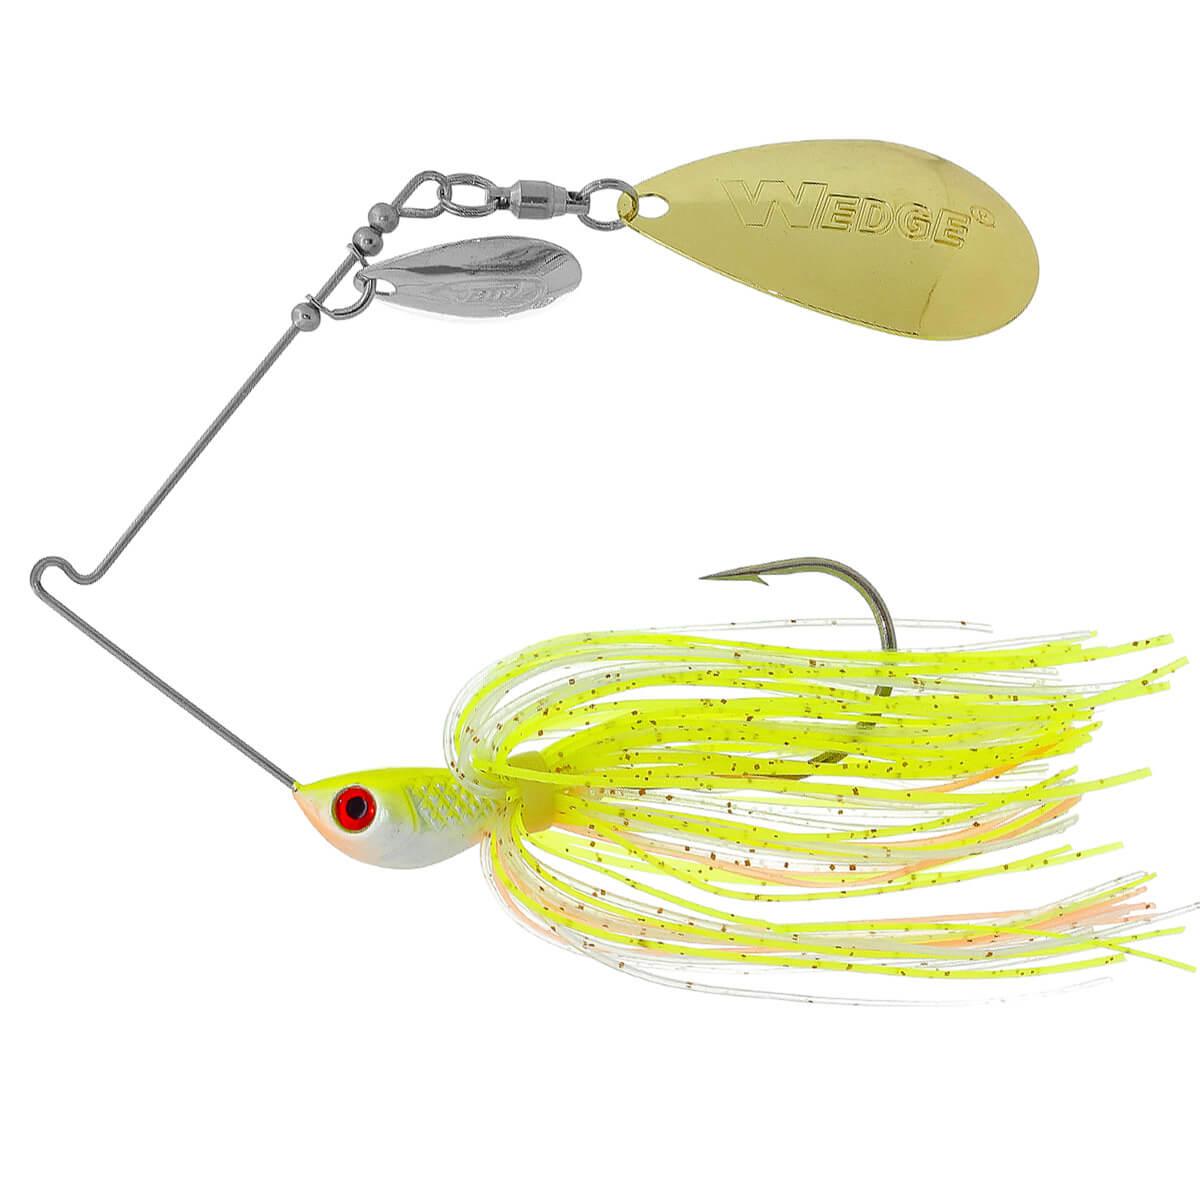 Spinner Stanley Wedge Plus - WSE 12-59T   14,0 gr